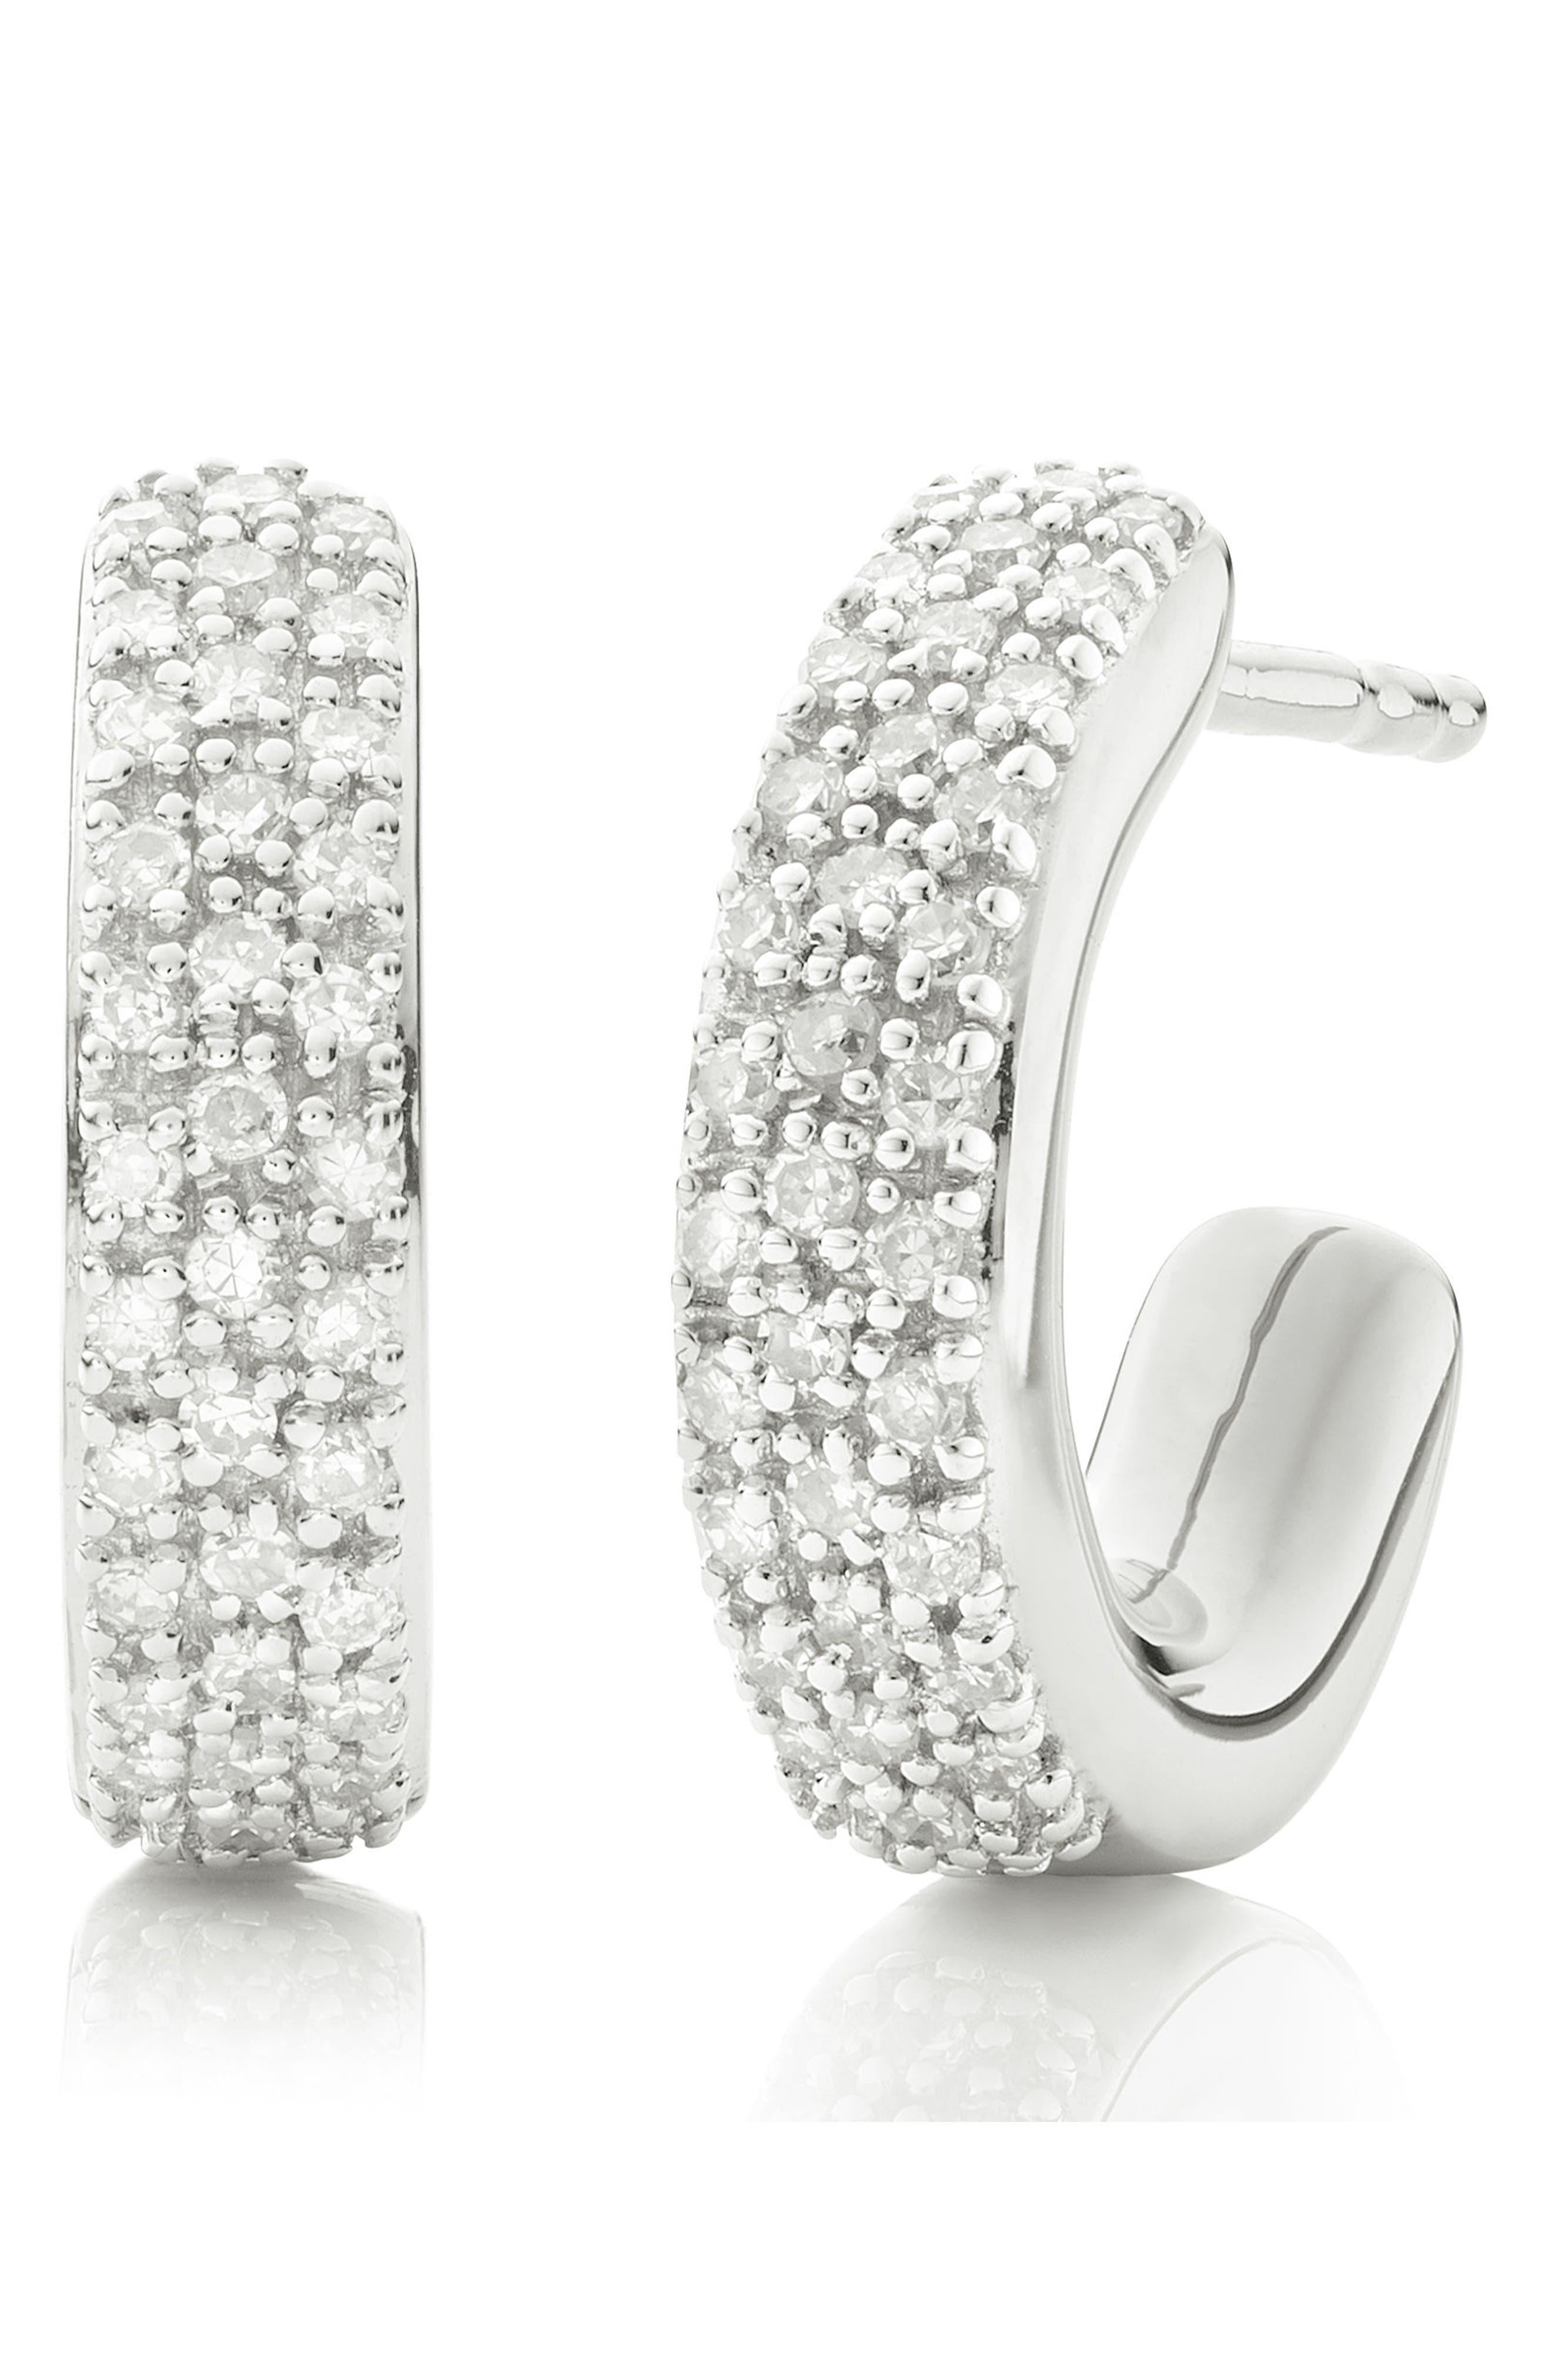 Fiji Mini Diamond Hoop Earrings,                             Main thumbnail 1, color,                             Silver